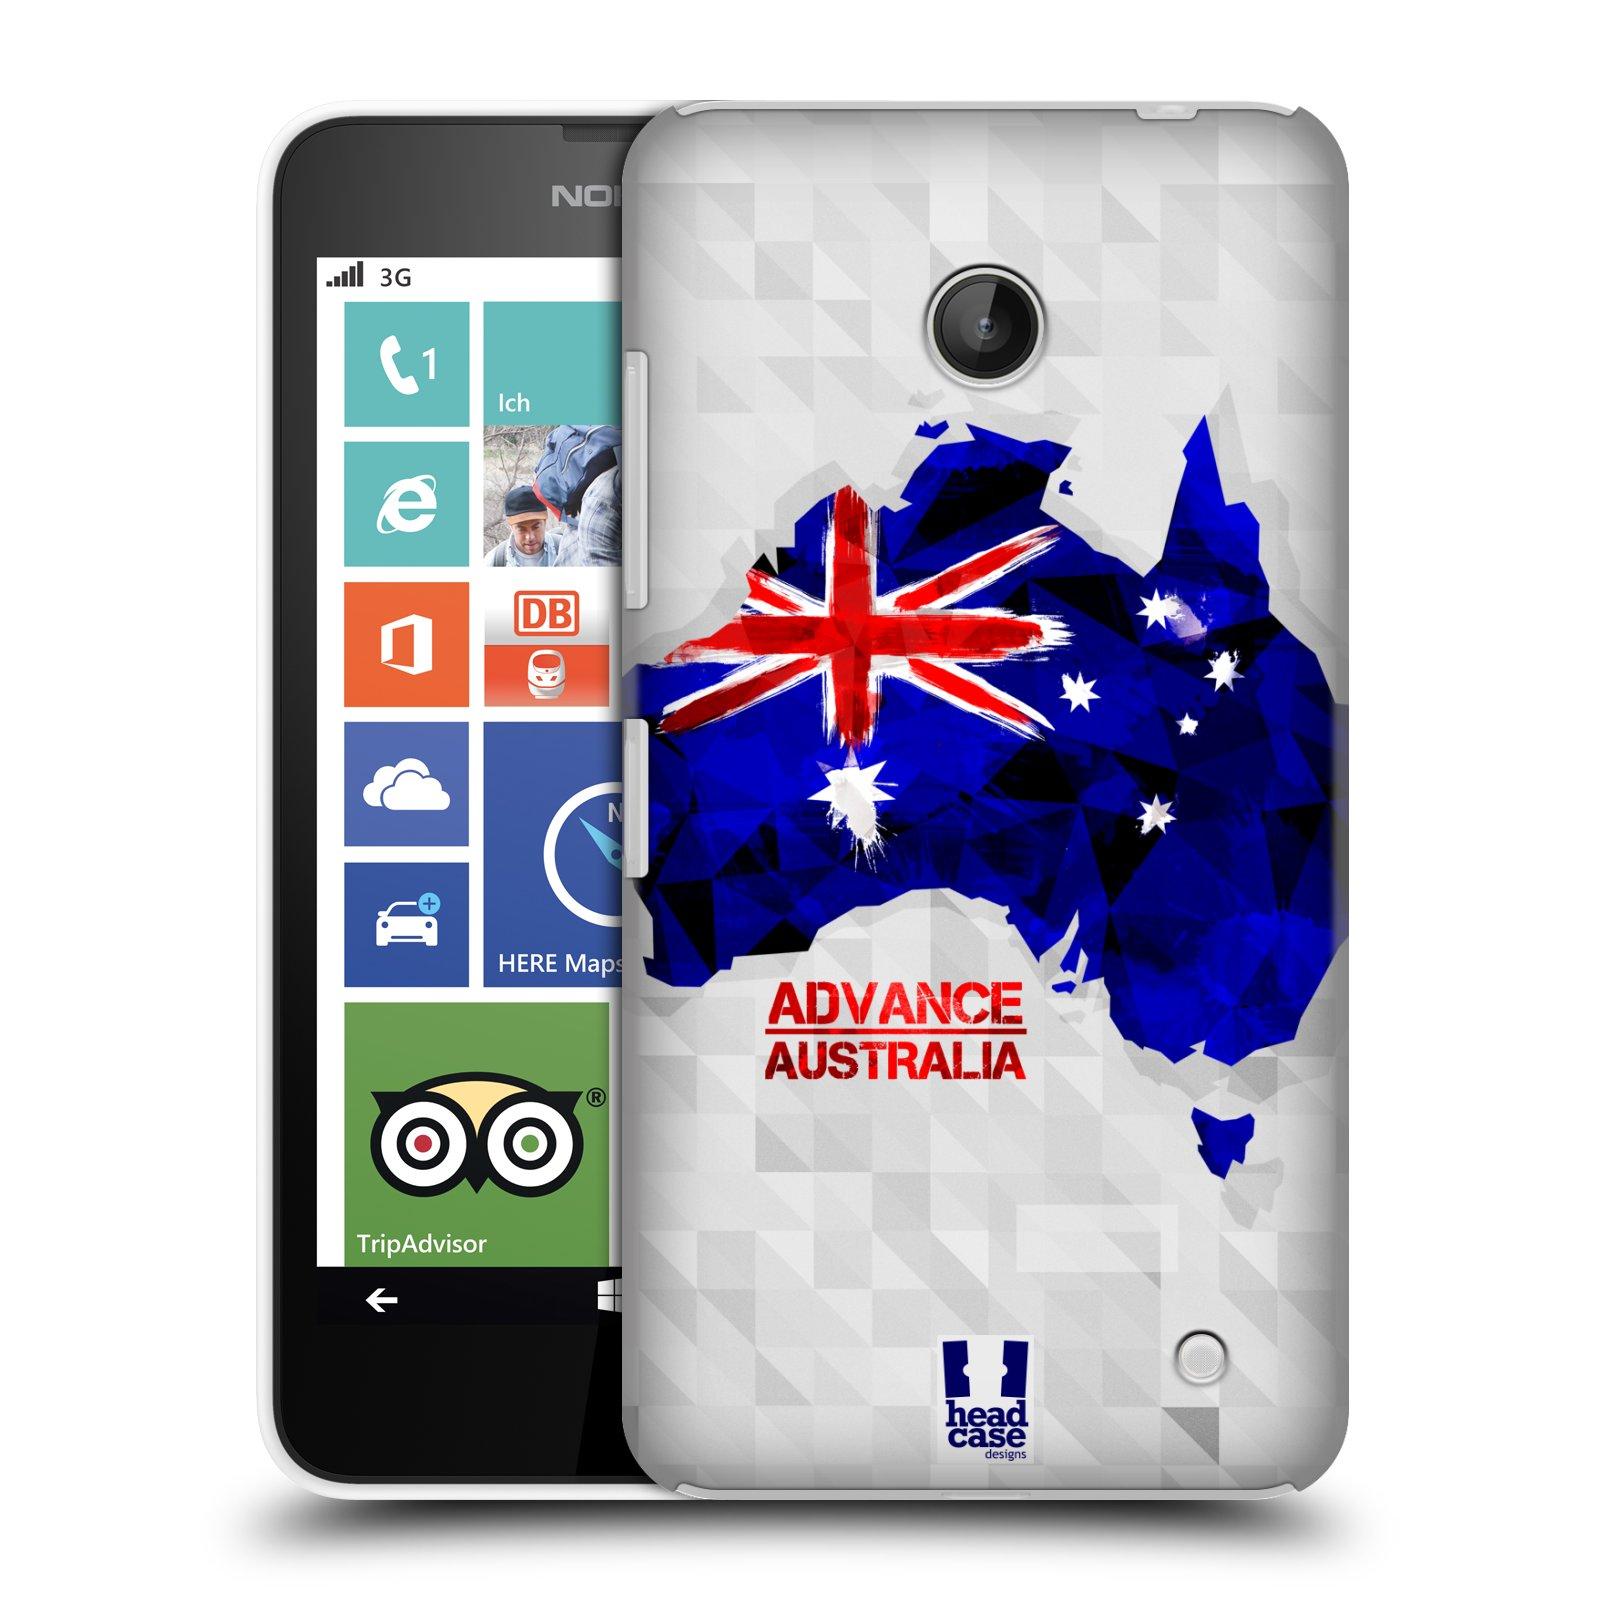 Plastové pouzdro na mobil Nokia Lumia 630 HEAD CASE GEOMAPA AUSTRÁLIE (Kryt či obal na mobilní telefon Nokia Lumia 630 a Nokia Lumia 630 Dual SIM)